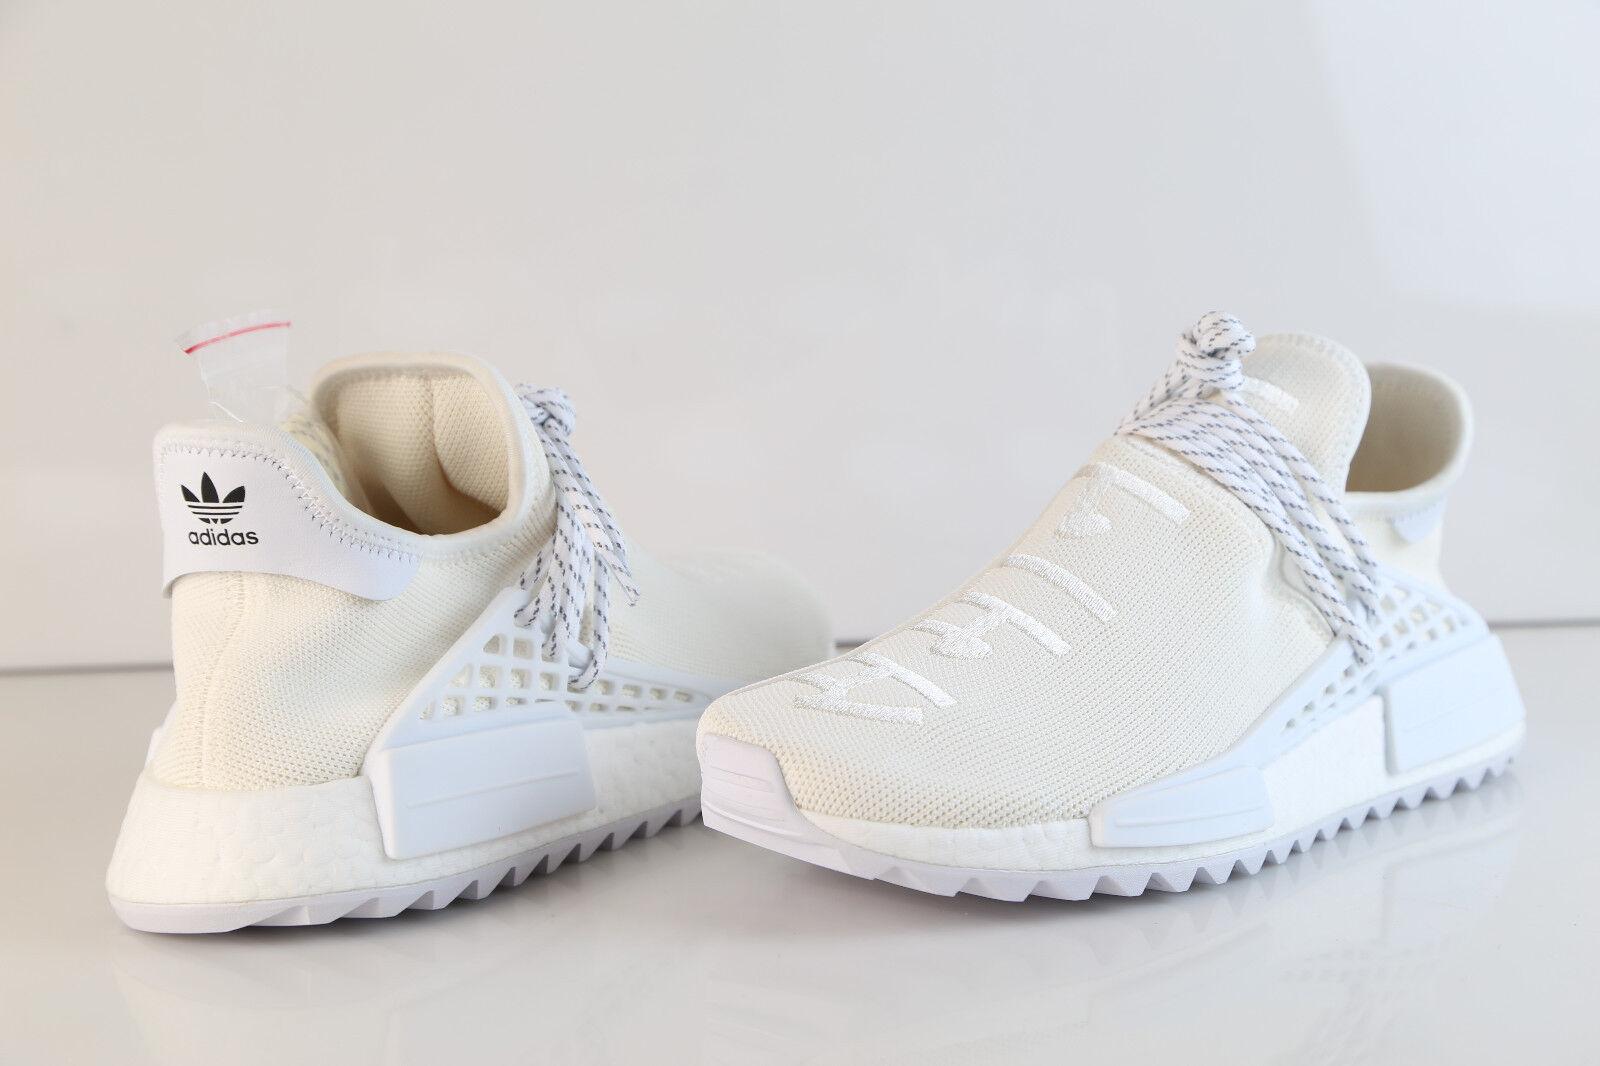 Adidas PW Pharrell Williams HU Human Race HOLI NMD Trail BC Blank AC7031 7-13 pk